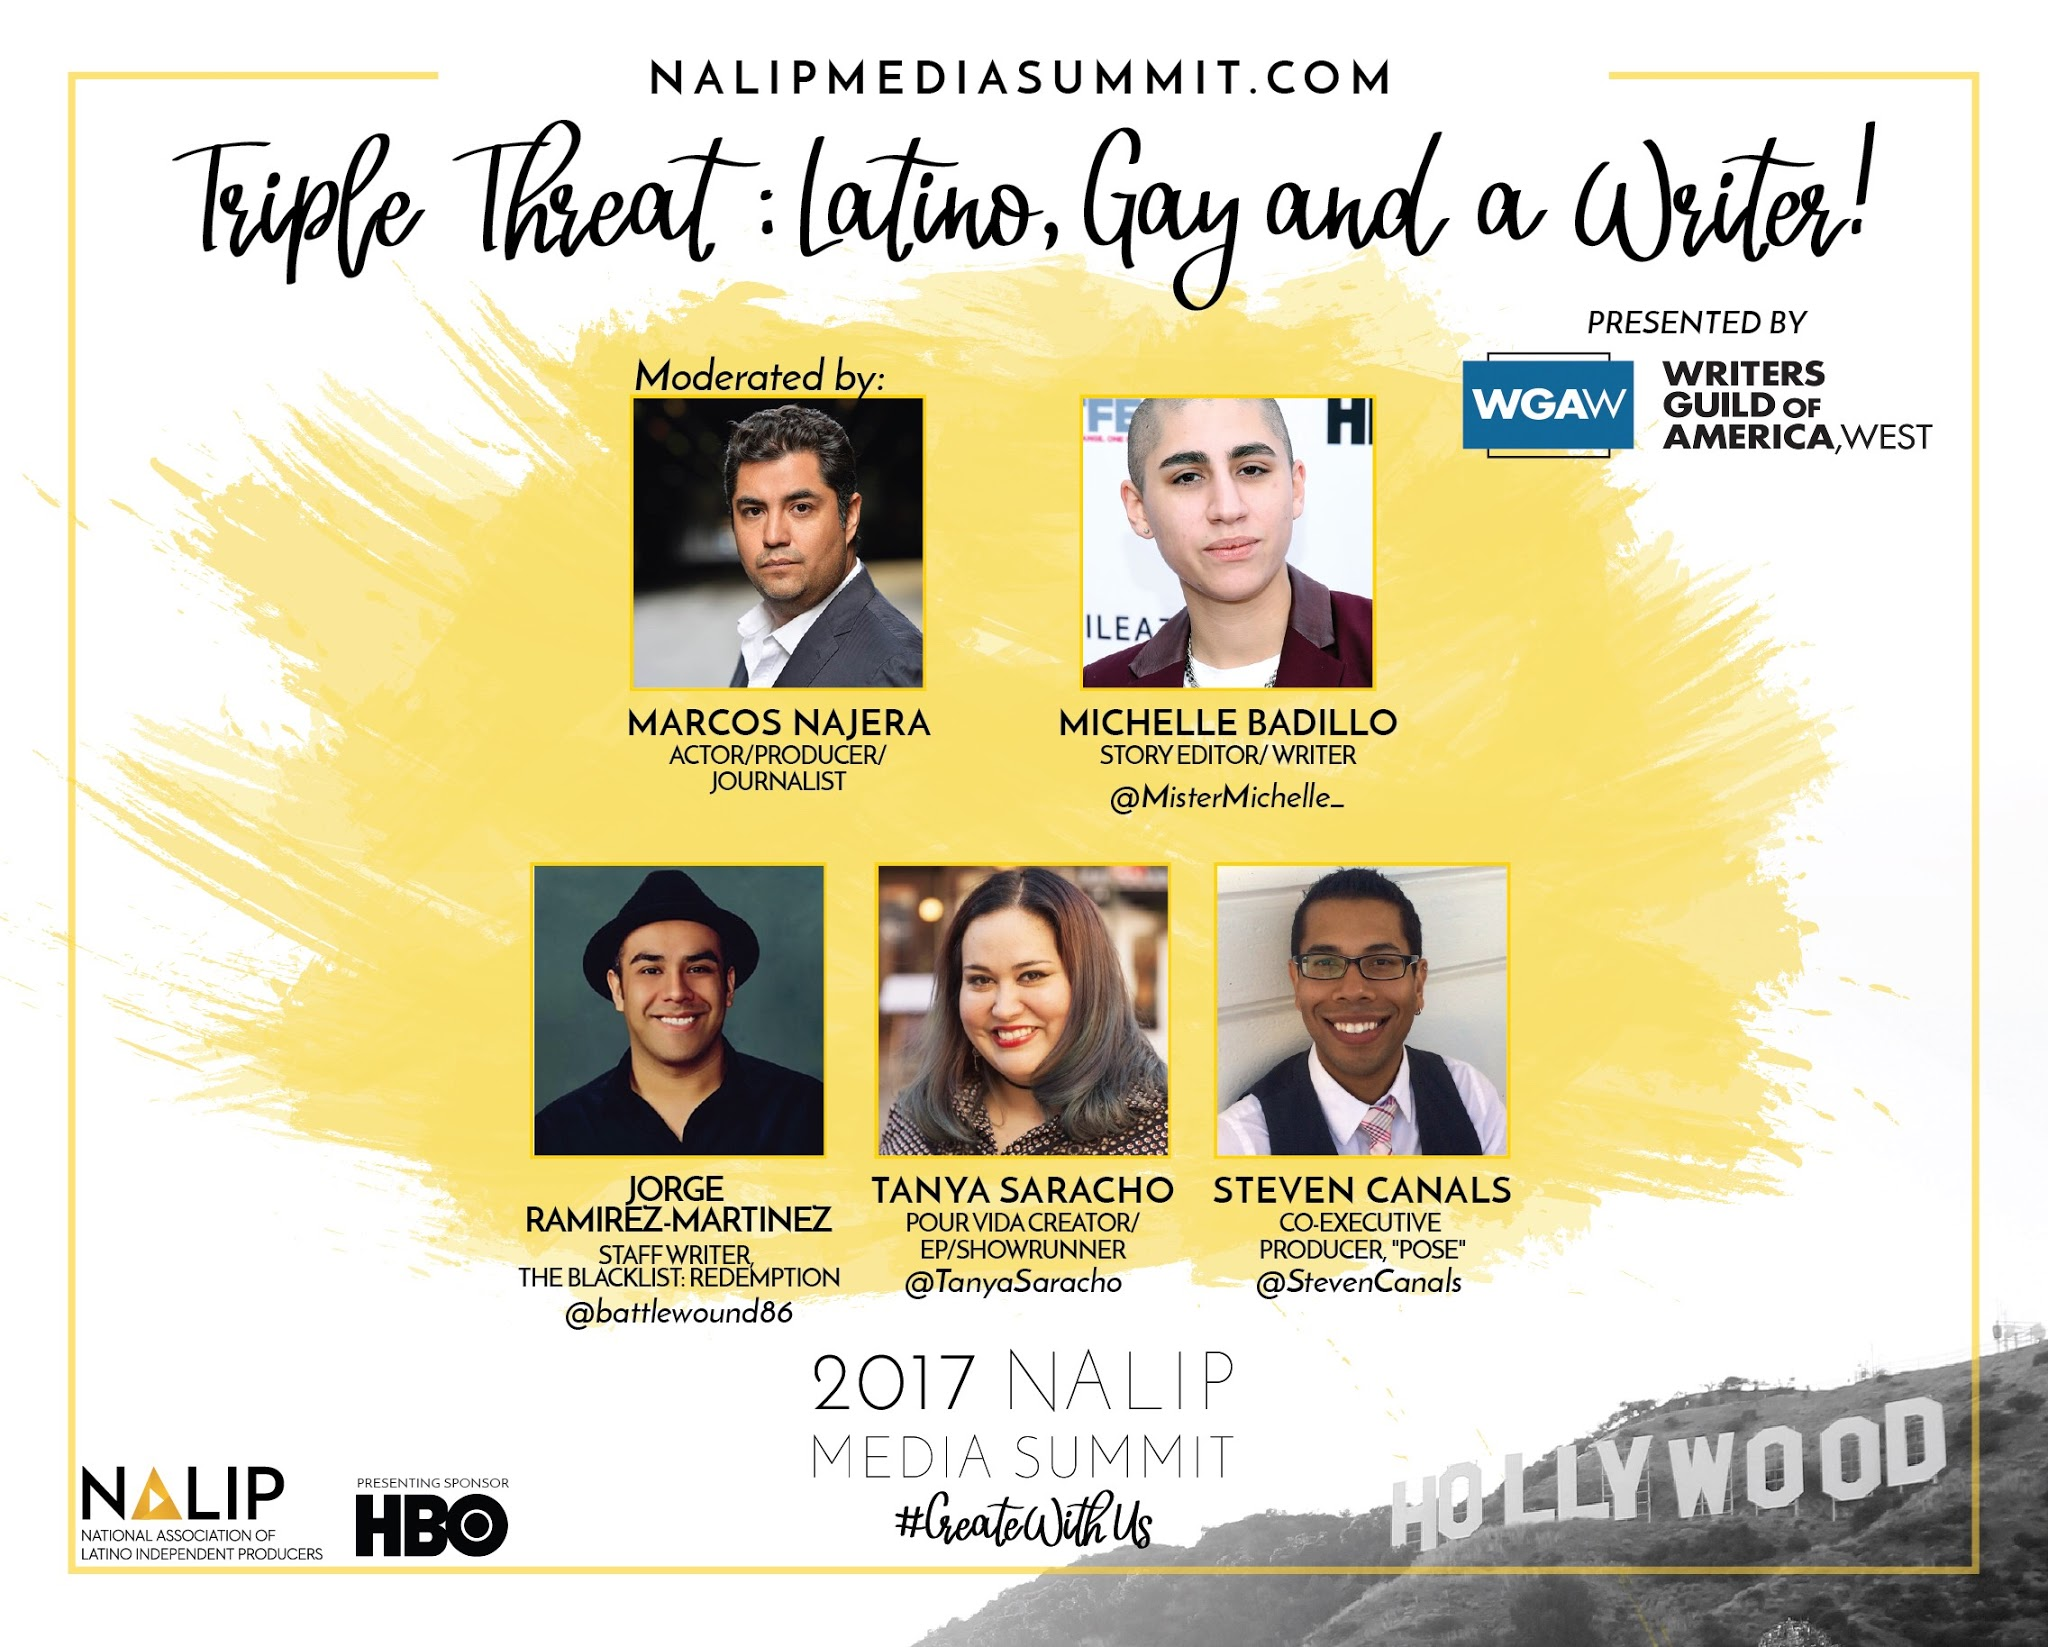 WGAW to Present Panel at 2017 Media Summit